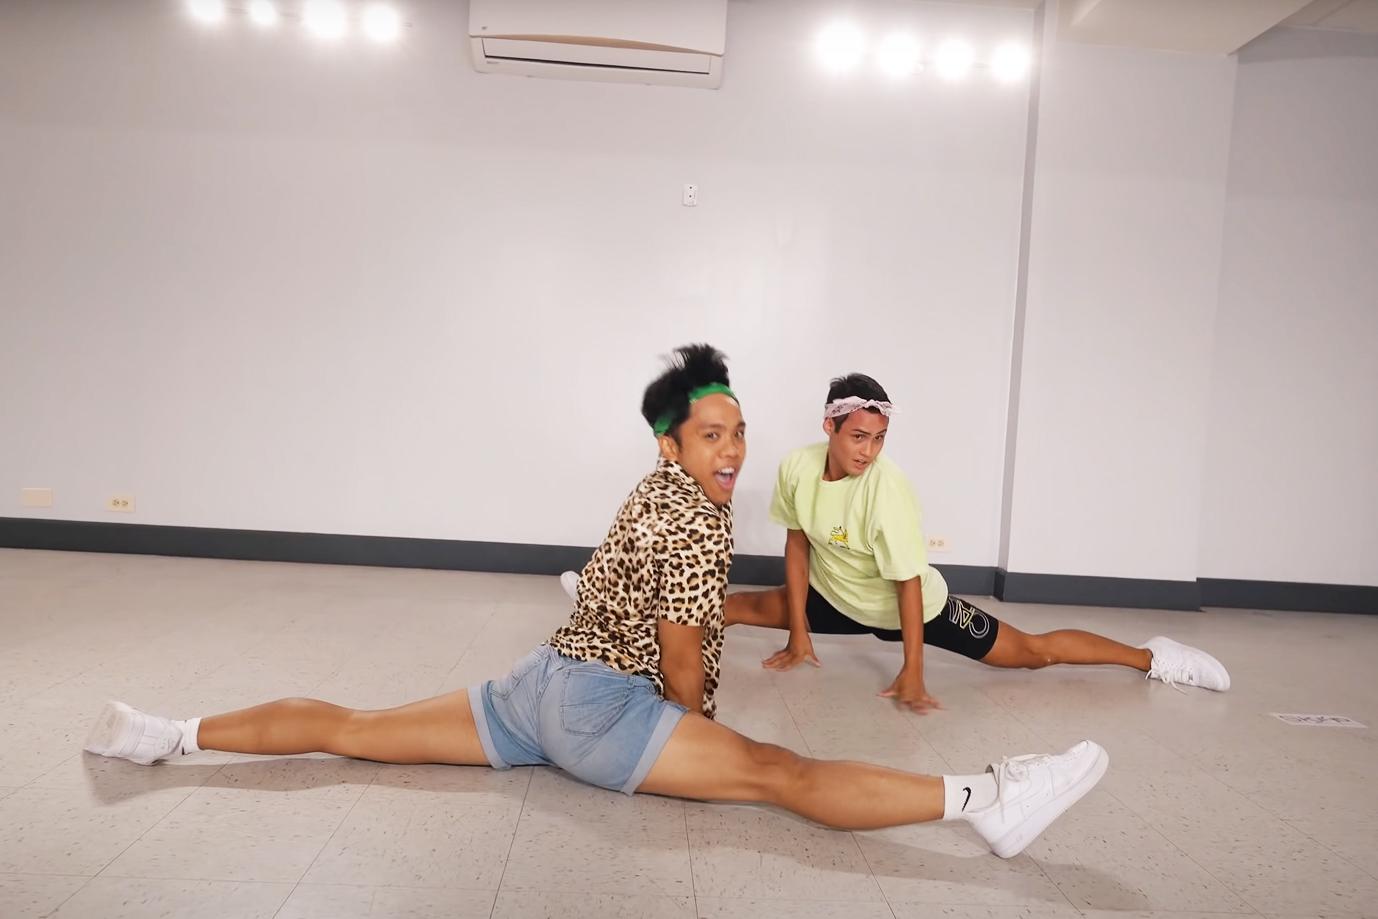 Cardi B Shared This Choreographer S Wap Dance Then It Went Viral On Tiktok